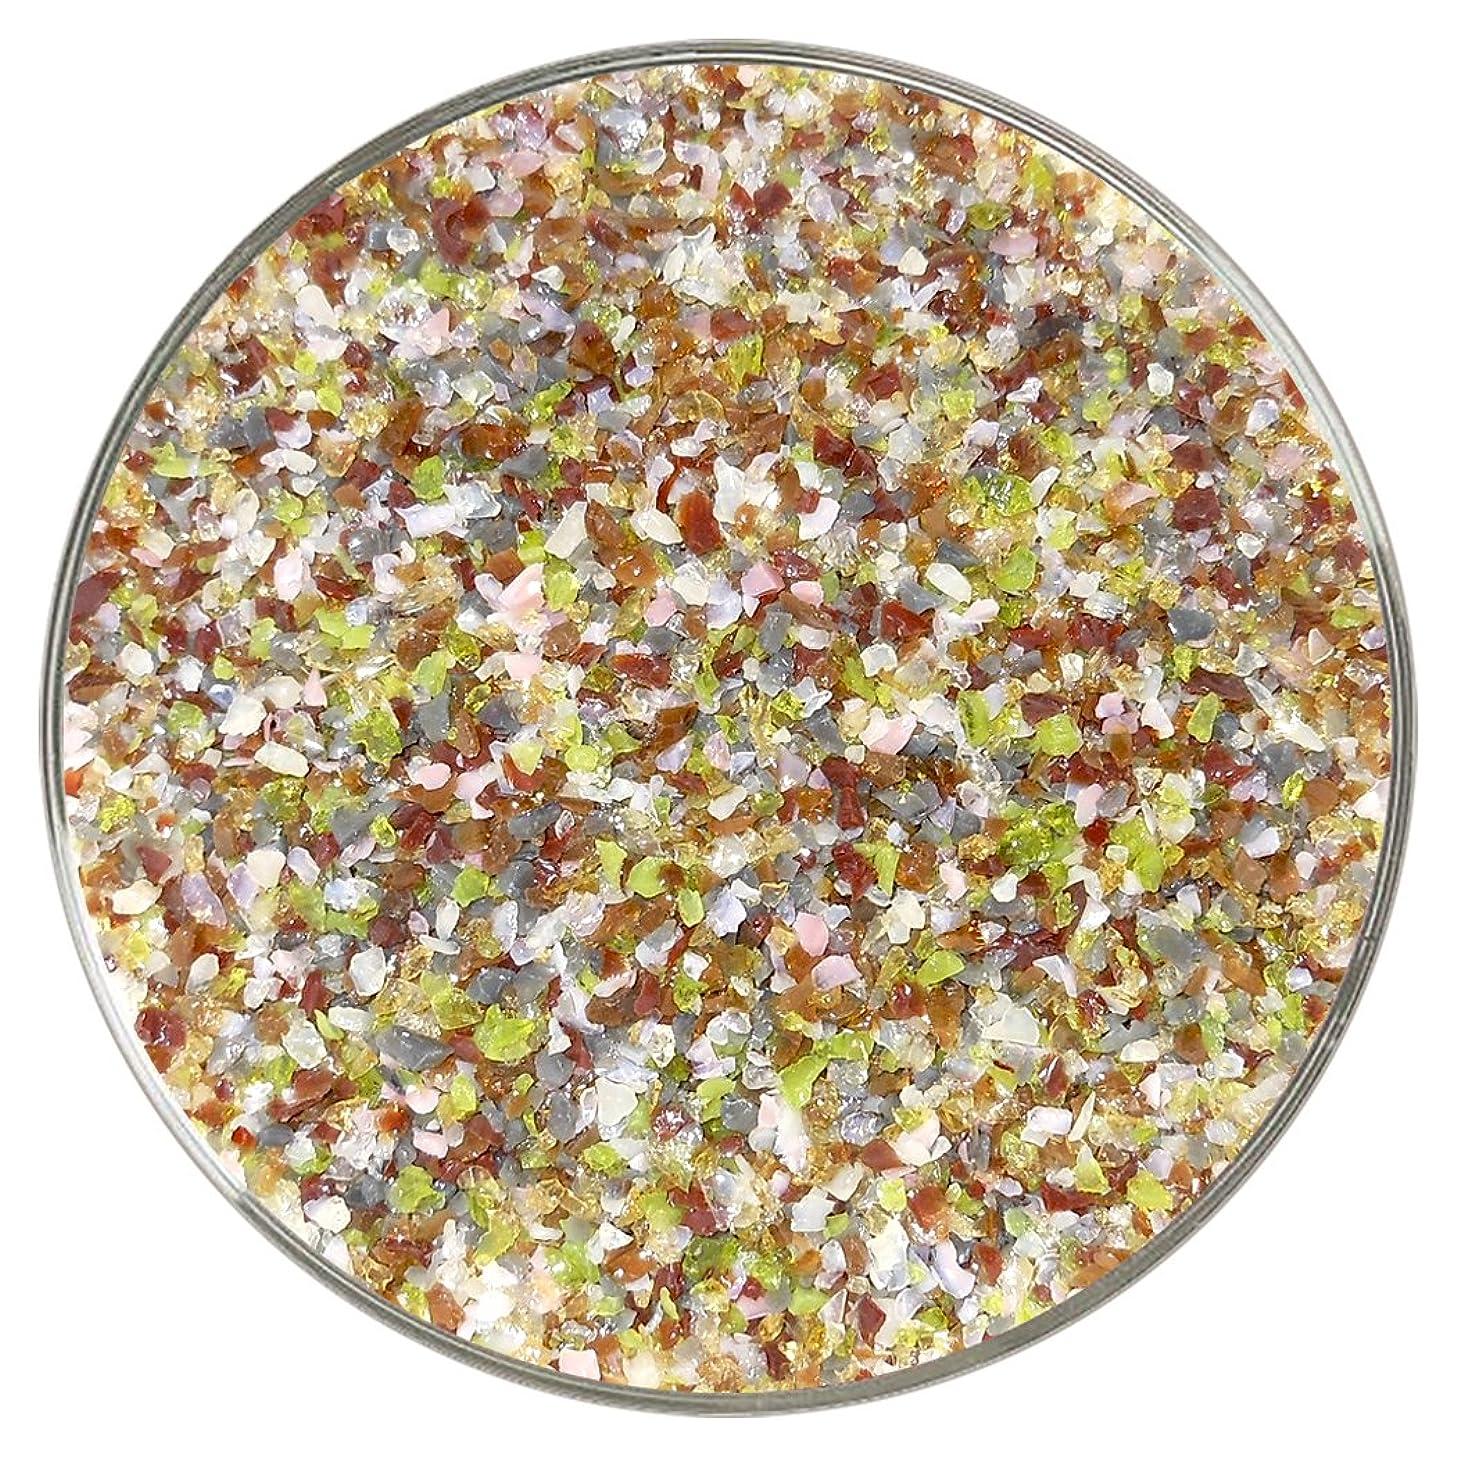 New Hampshire Craftworks Potpourri Designer Medium Frit Mix - 4oz - 90COE - Made From Bullseye Glass